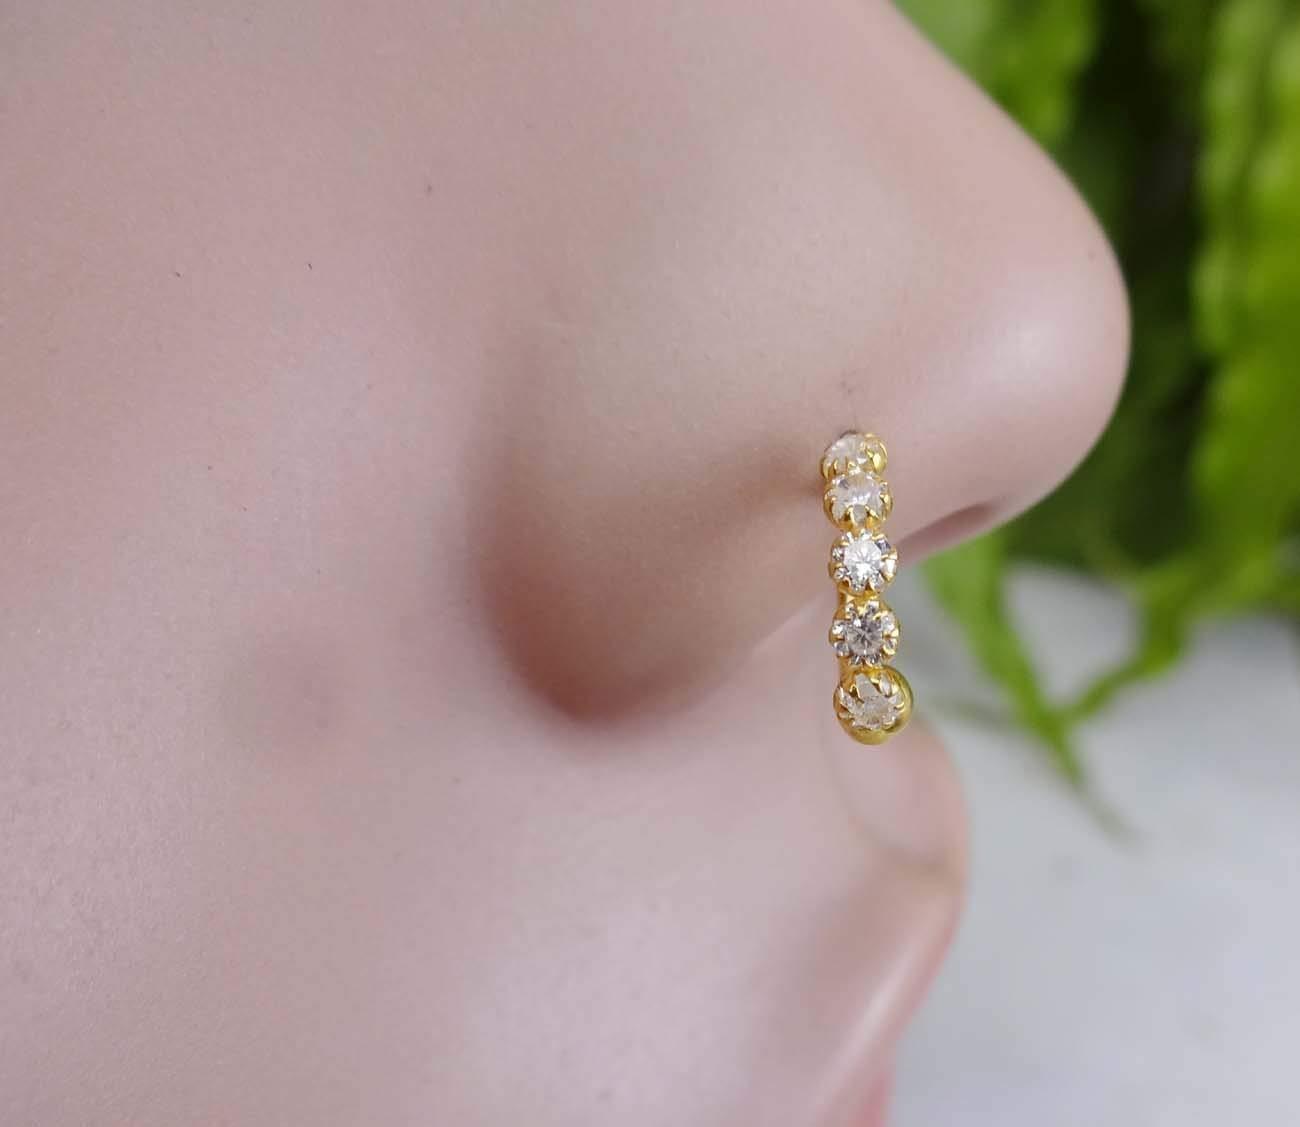 Diamond Nose Stud,Monroe Piercing,Gold Nose Ring,White Gold Nose Ring,Crystal Gold Piercing,Indian Nose Jewelry,Indian Nose Ring,Indian Gold Piercing,Gold Nose Hoop,Crystal Nose Ring(TEJ606)